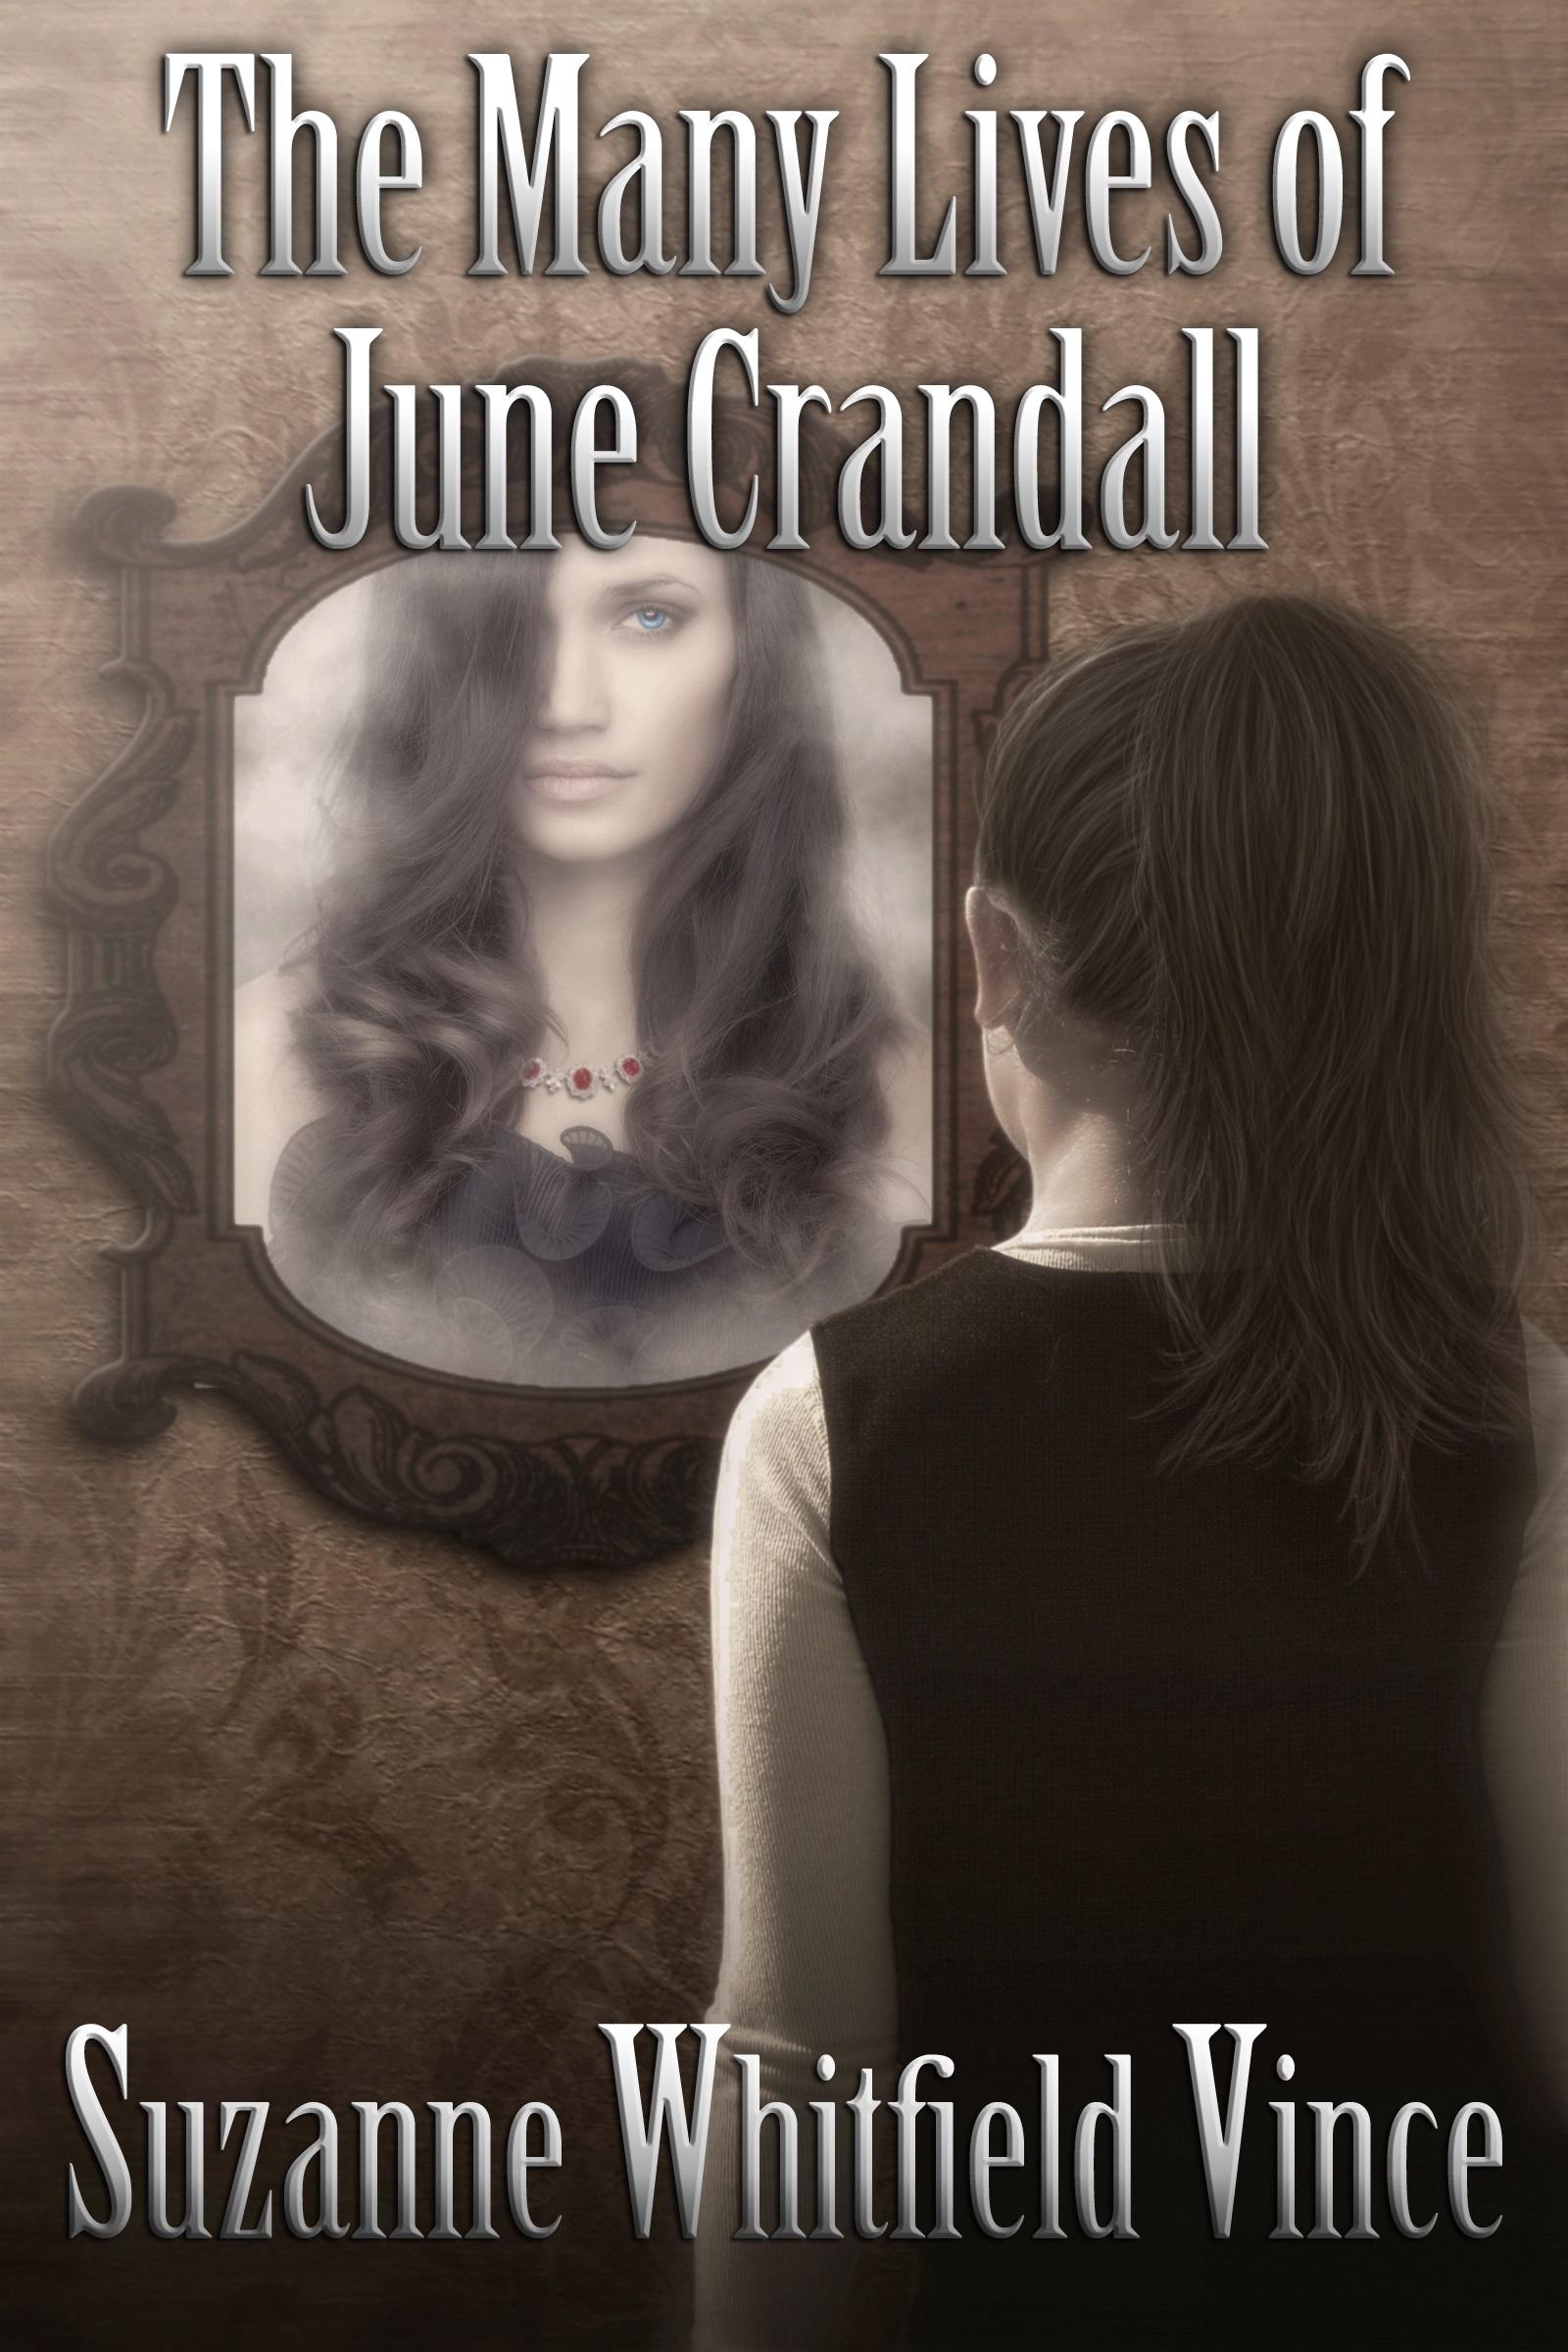 June Crandall